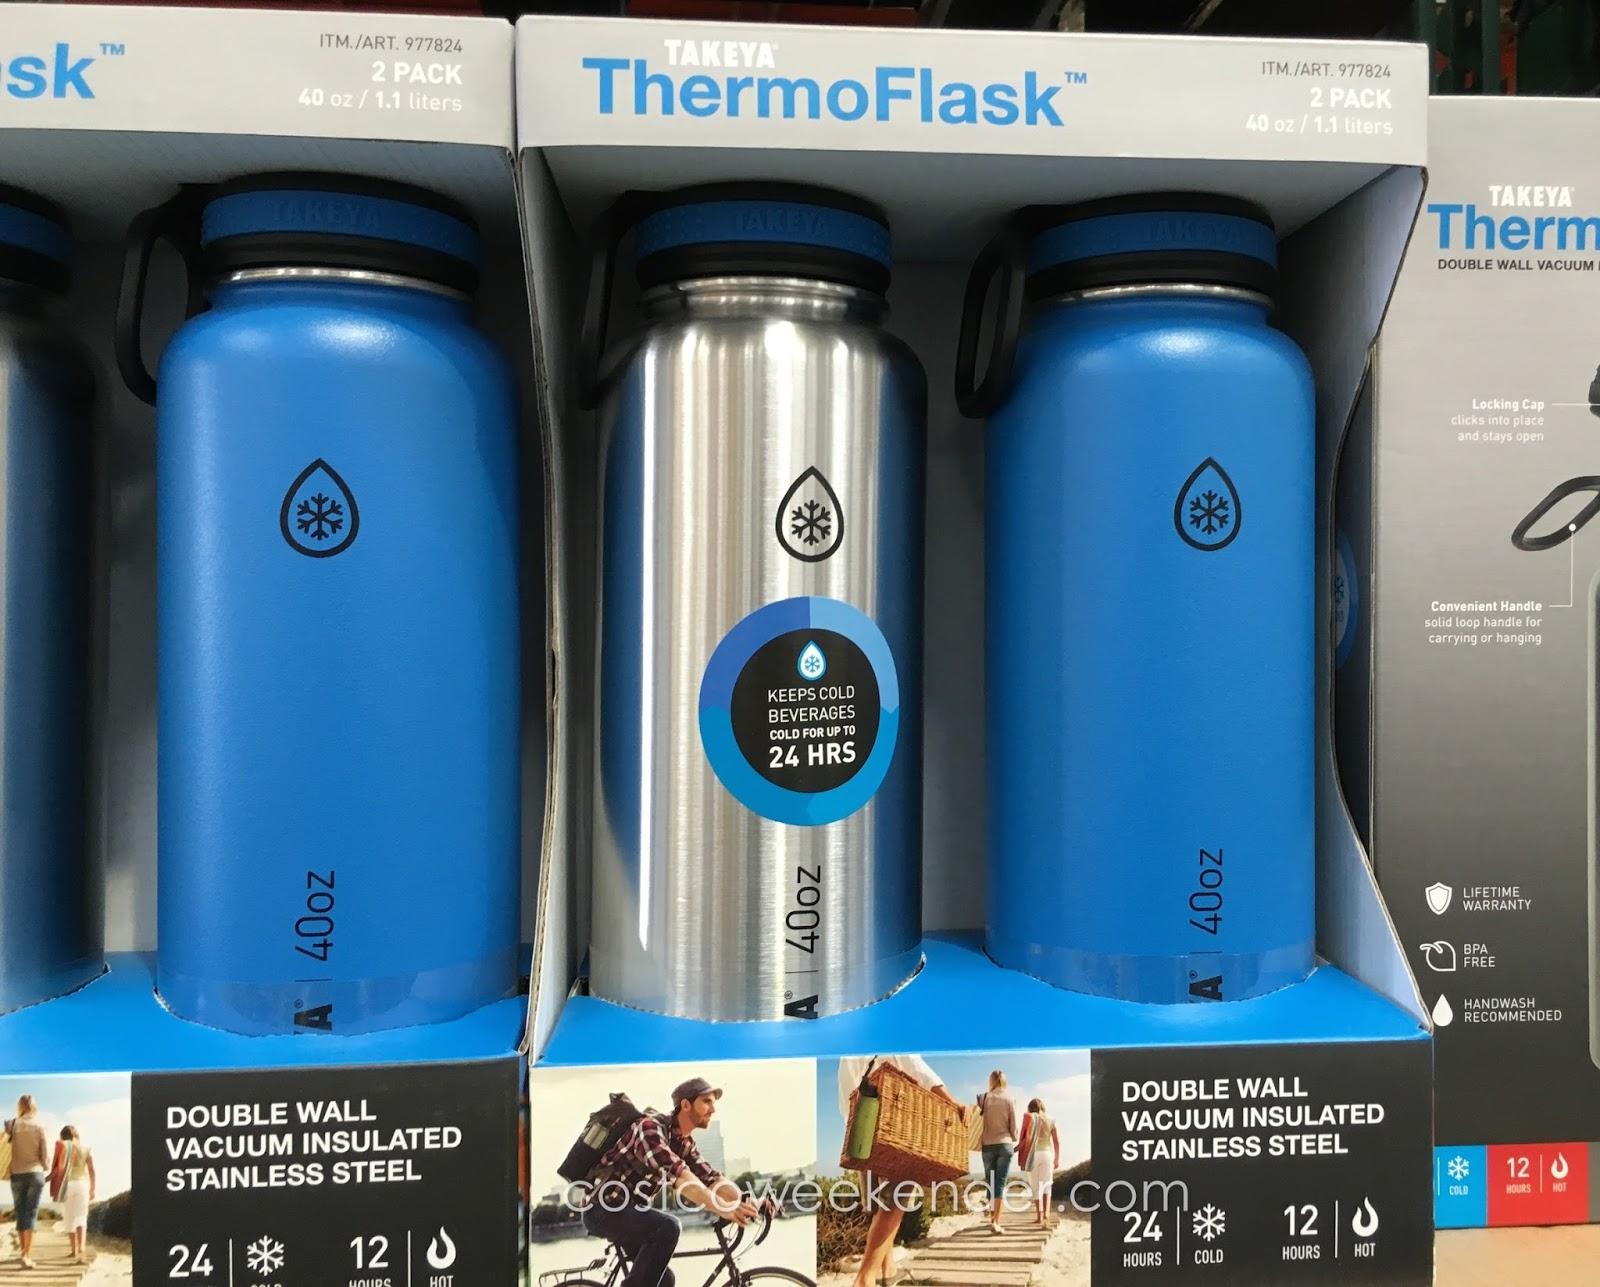 Takeya ThermoFlask Water Bottle (2 pack) | Costco Weekender